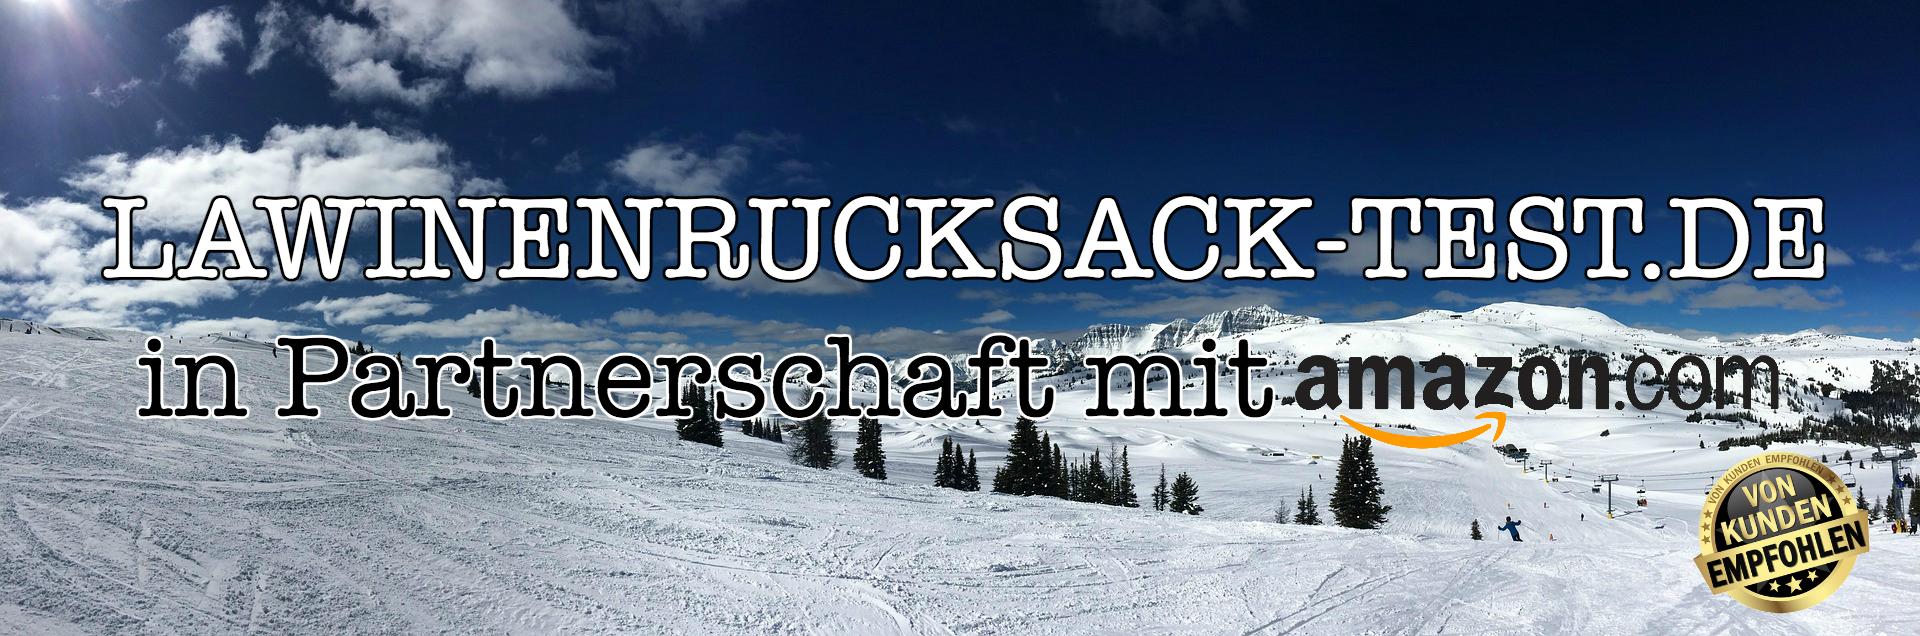 Lawinenrucksack-test.de